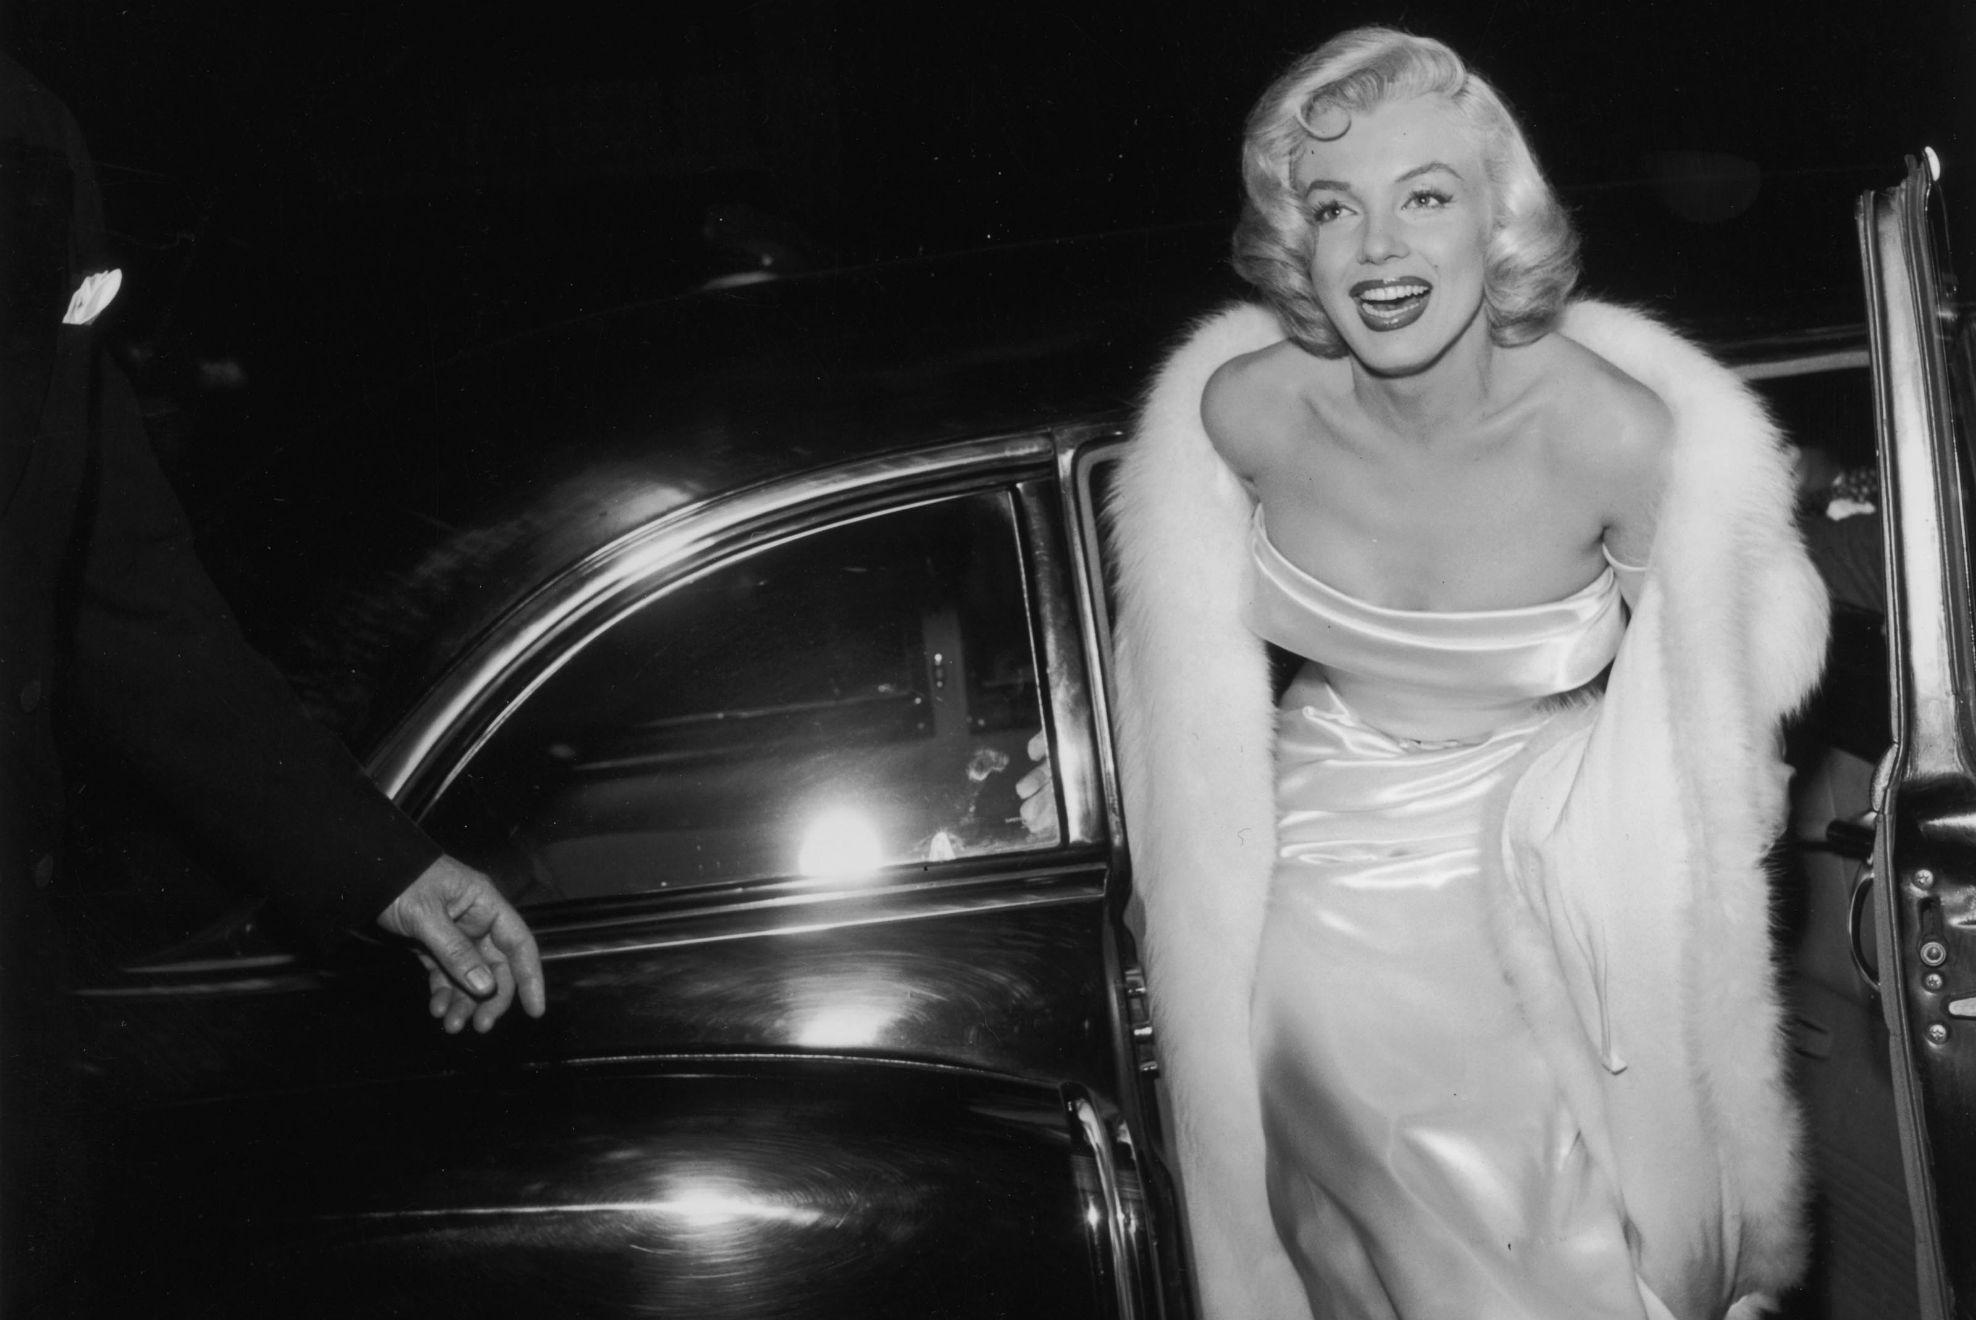 Marilyn monroe full hd wallpaper and background image 1976x1320 id 167660 - Marilyn monroe wallpaper download ...